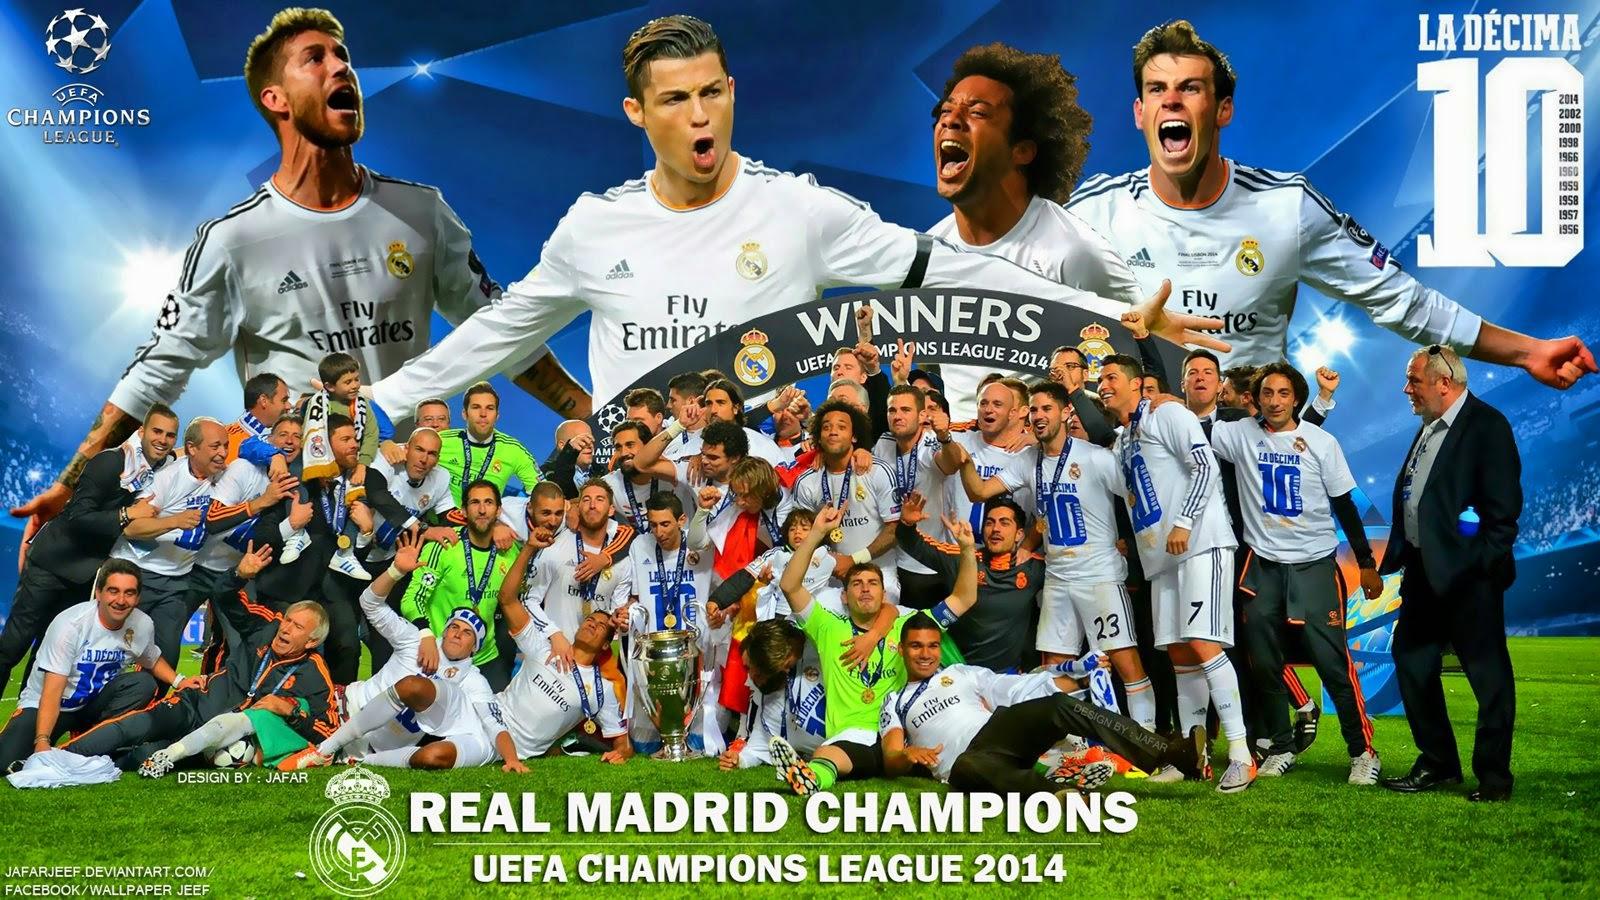 Real Madrid La Decima HD Wallpaper - Catatan Madridista